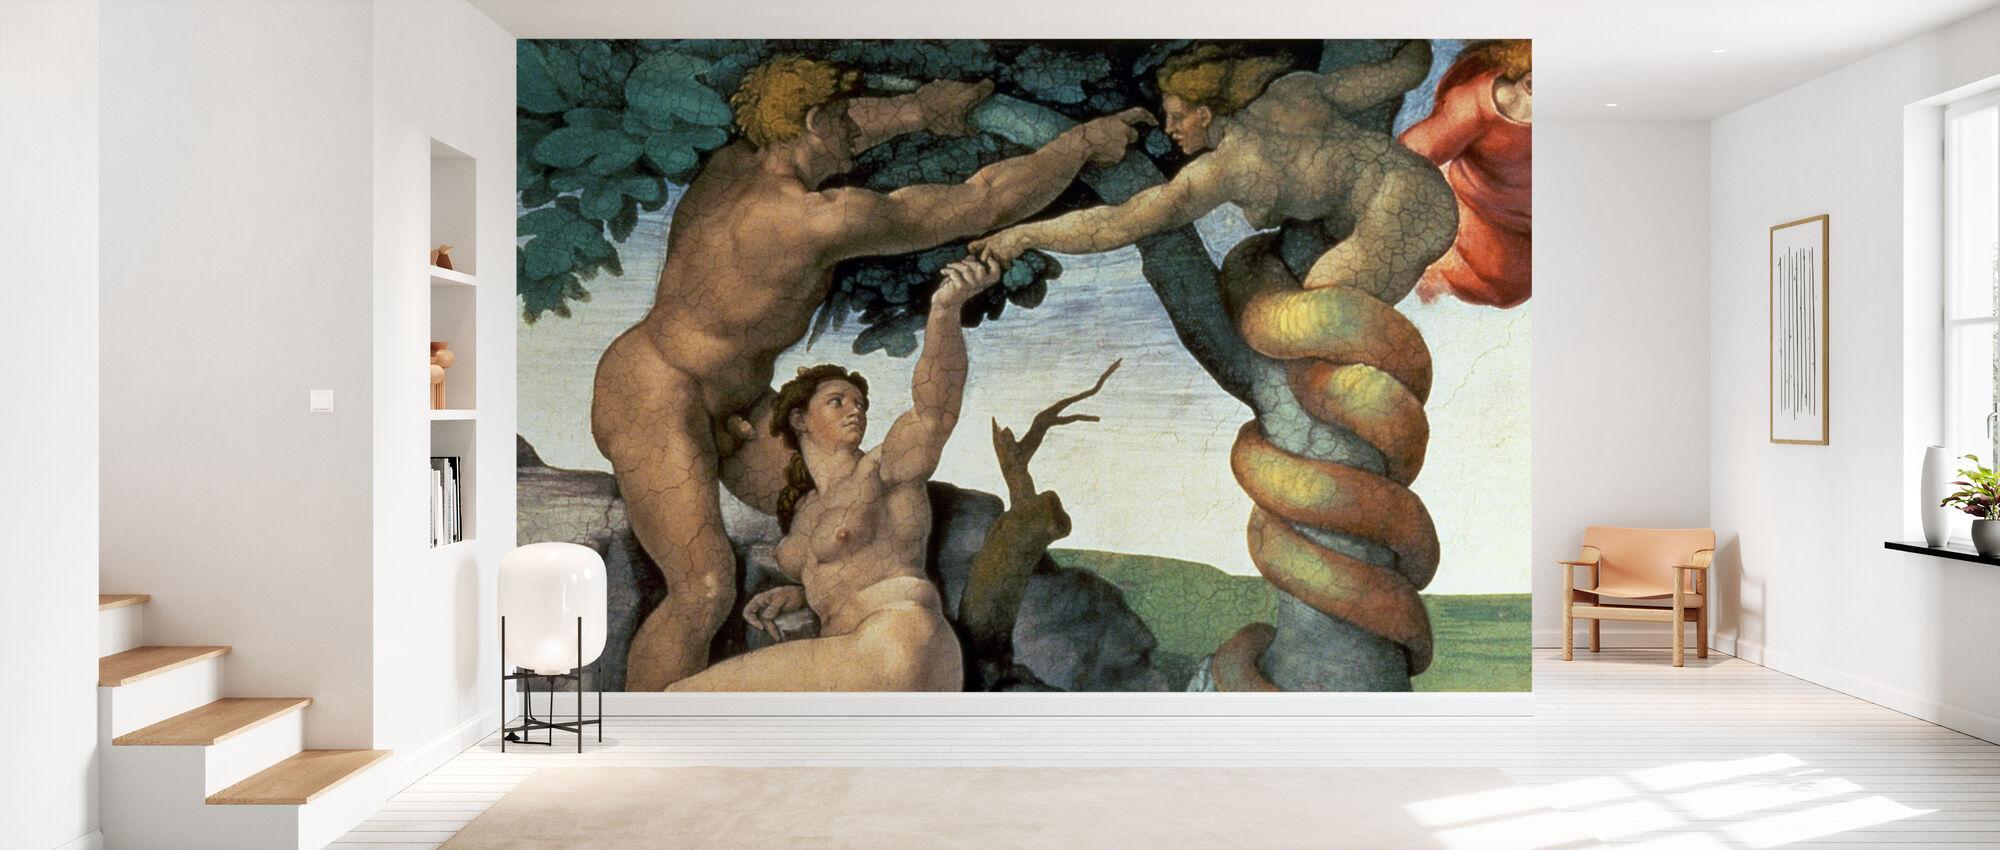 Sistine Chapel Ceiling, Michelangelo Buonarroti - Wallpaper - Hallway